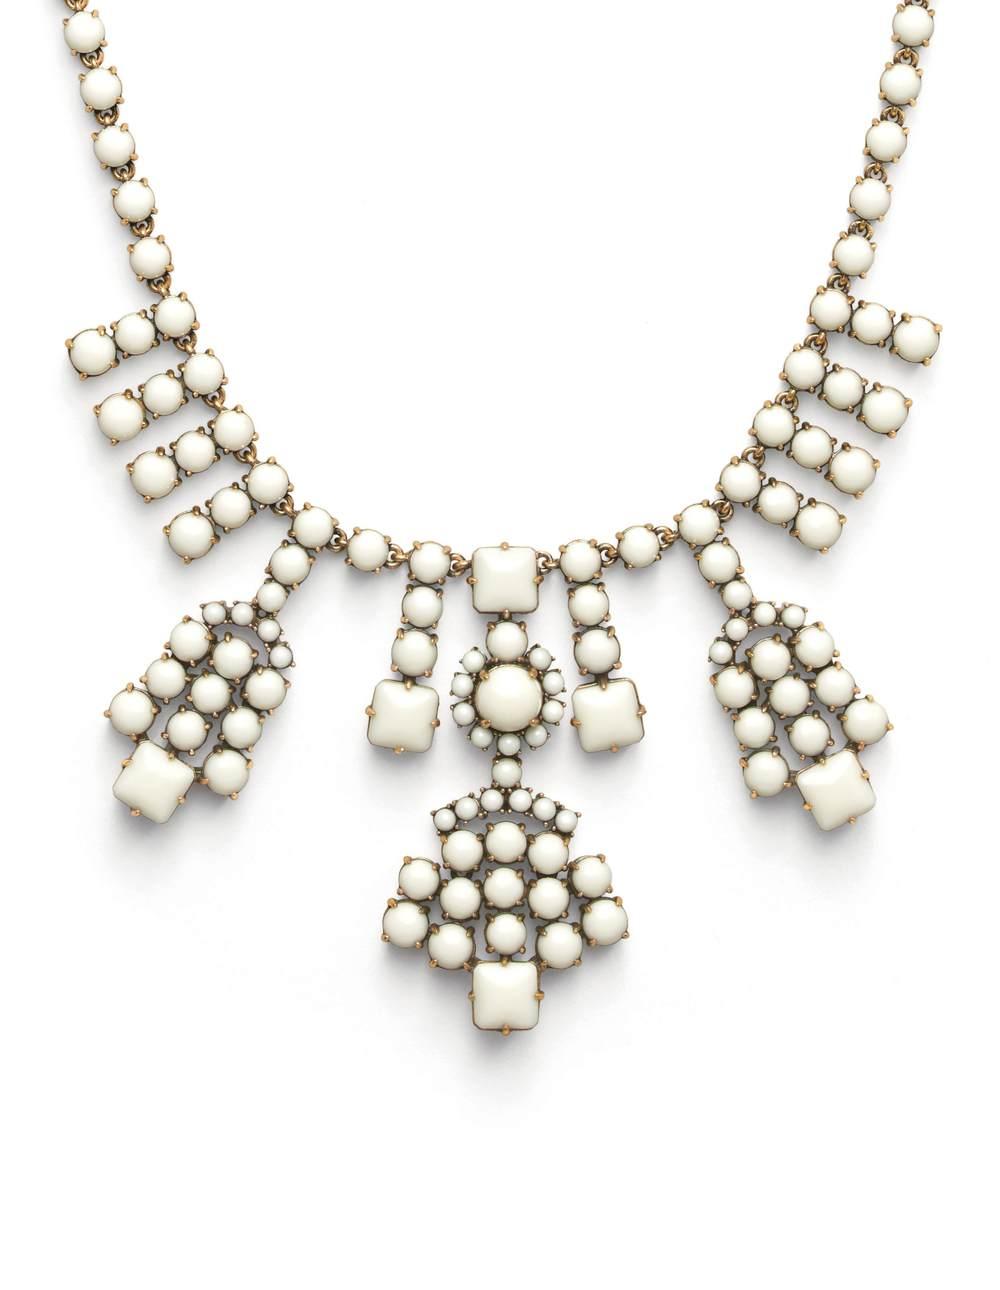 jcrew_catalog_jewelry_photography.jpg